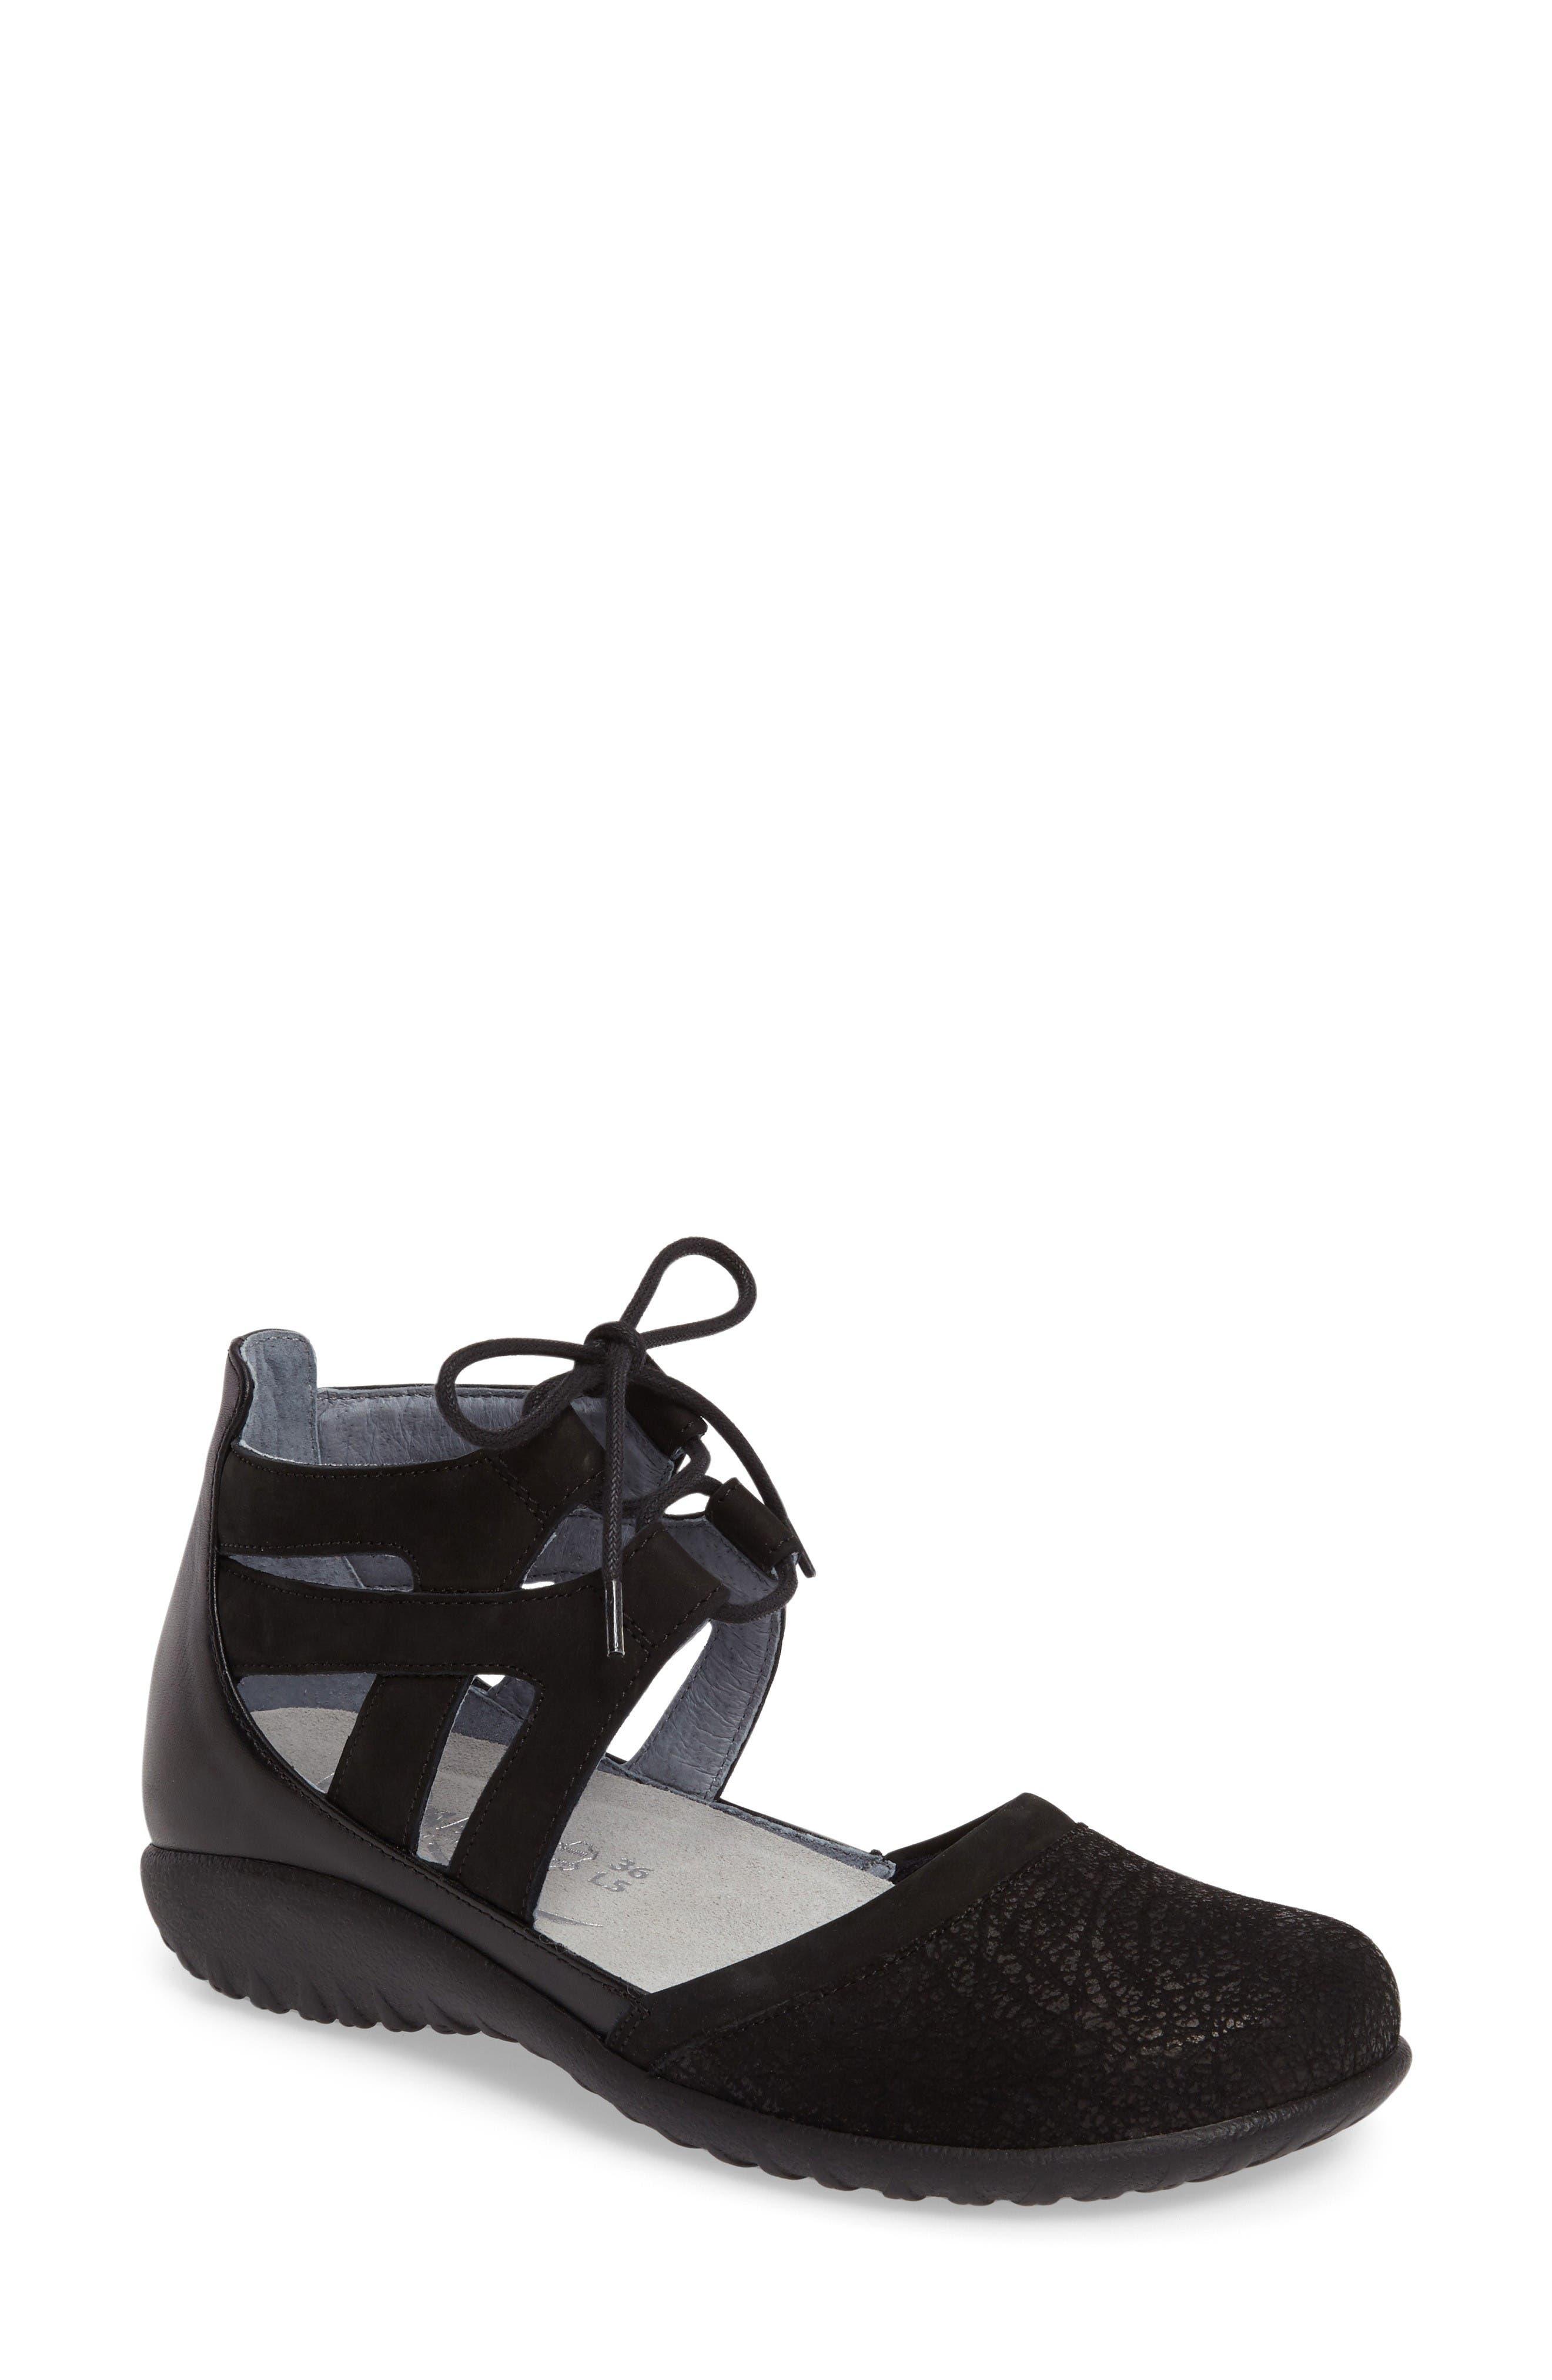 Alternate Image 1 Selected - Naot Kata Lace-Up Sandal (Women)